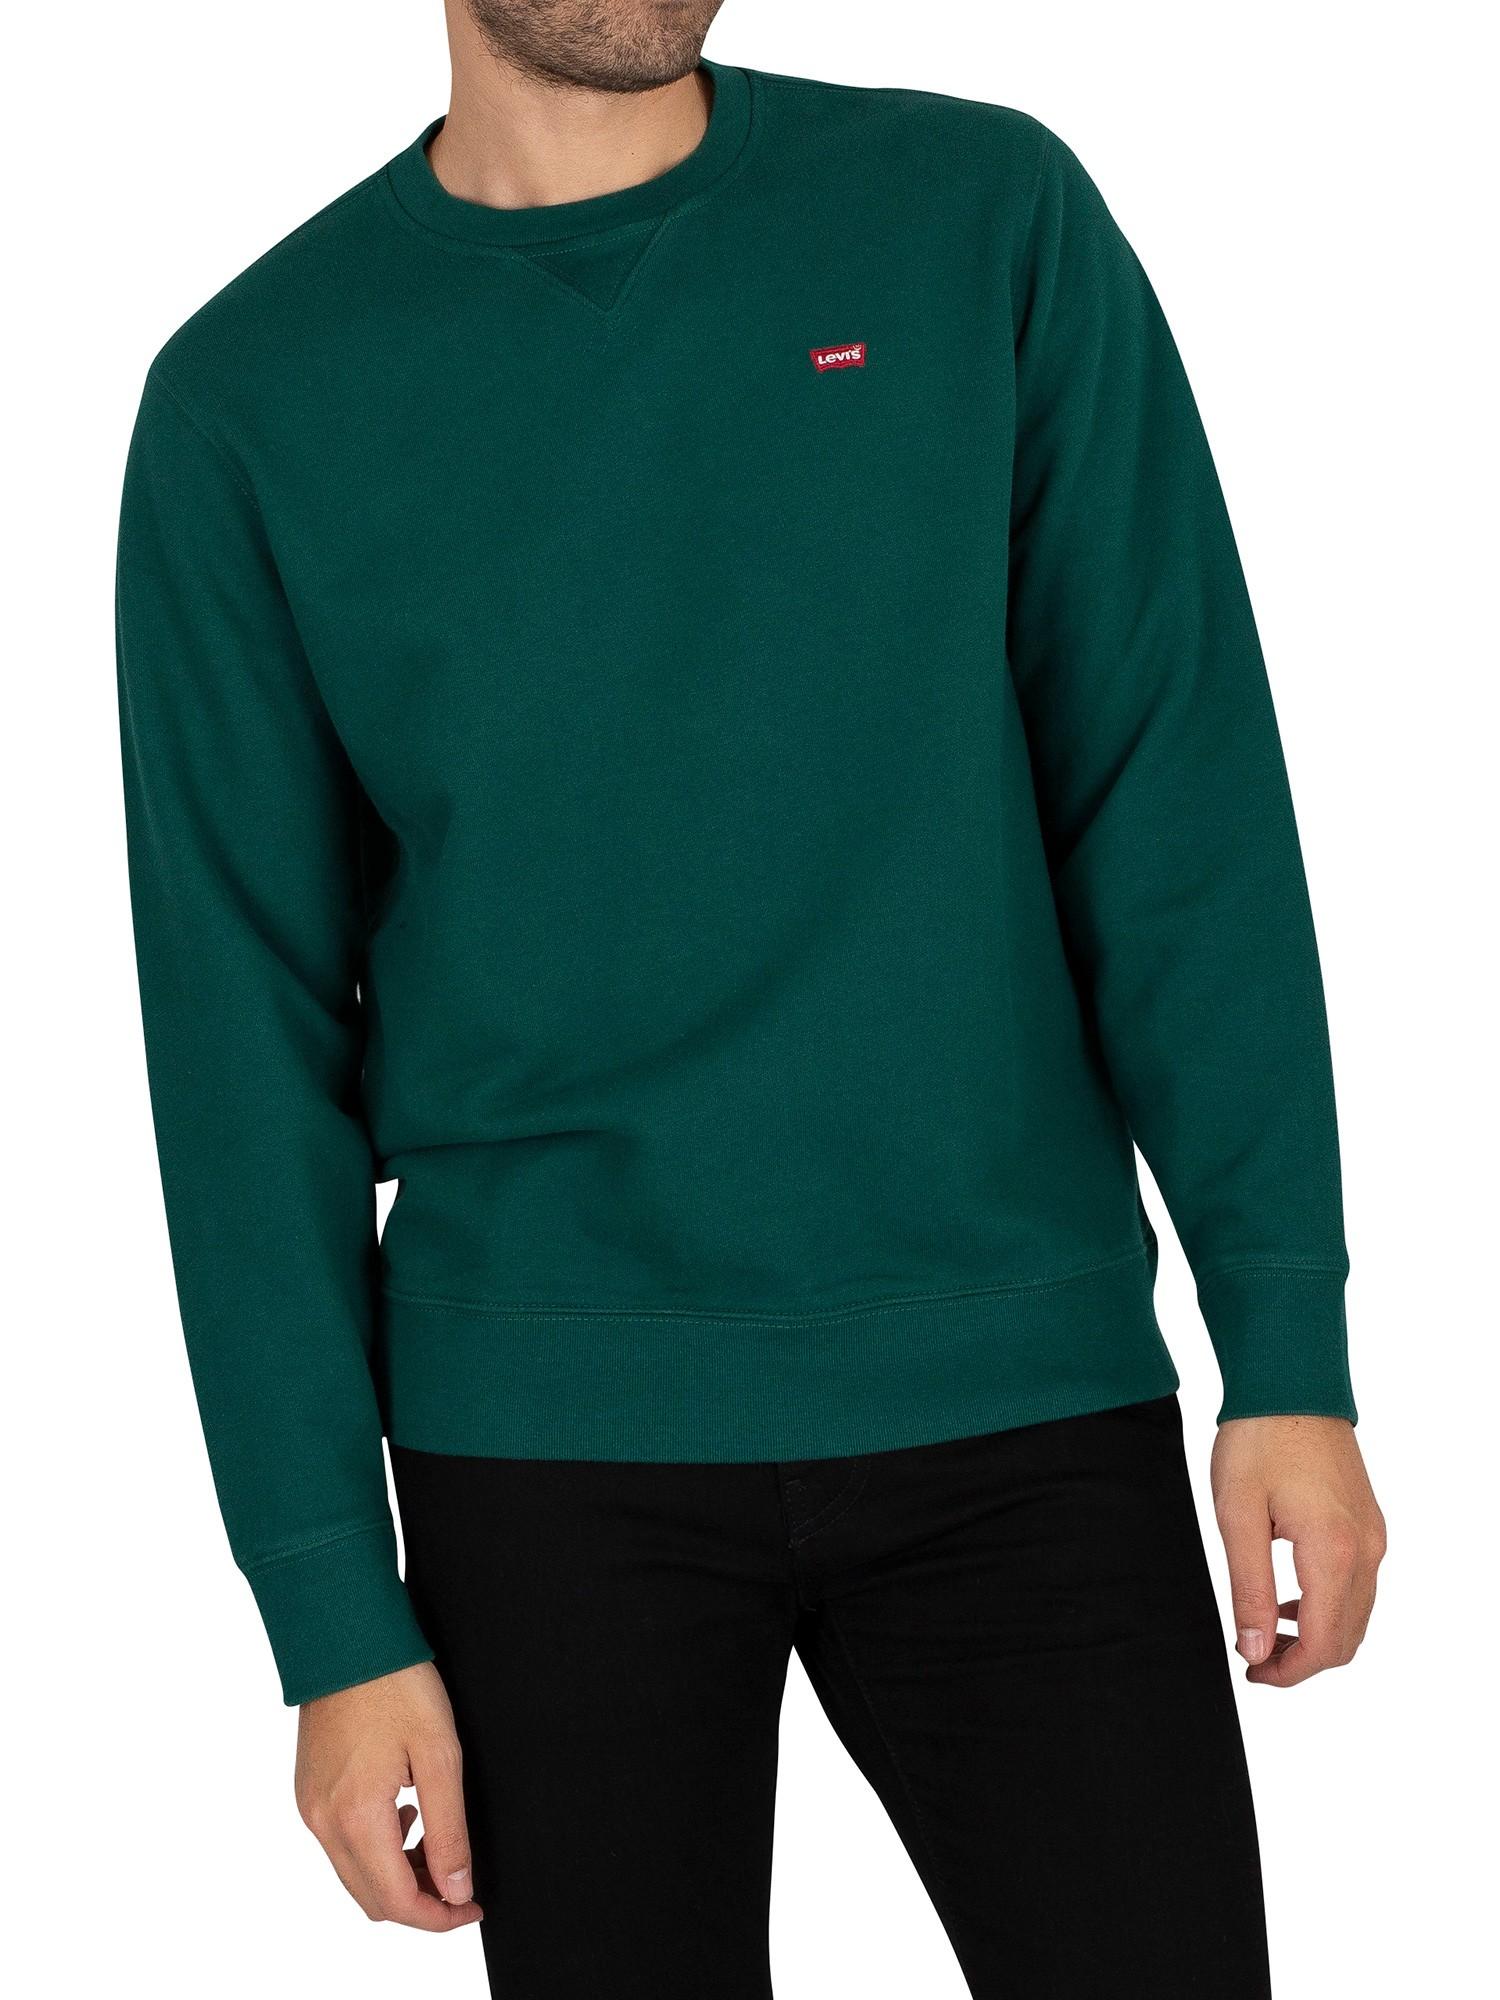 New Original Sweatshirt